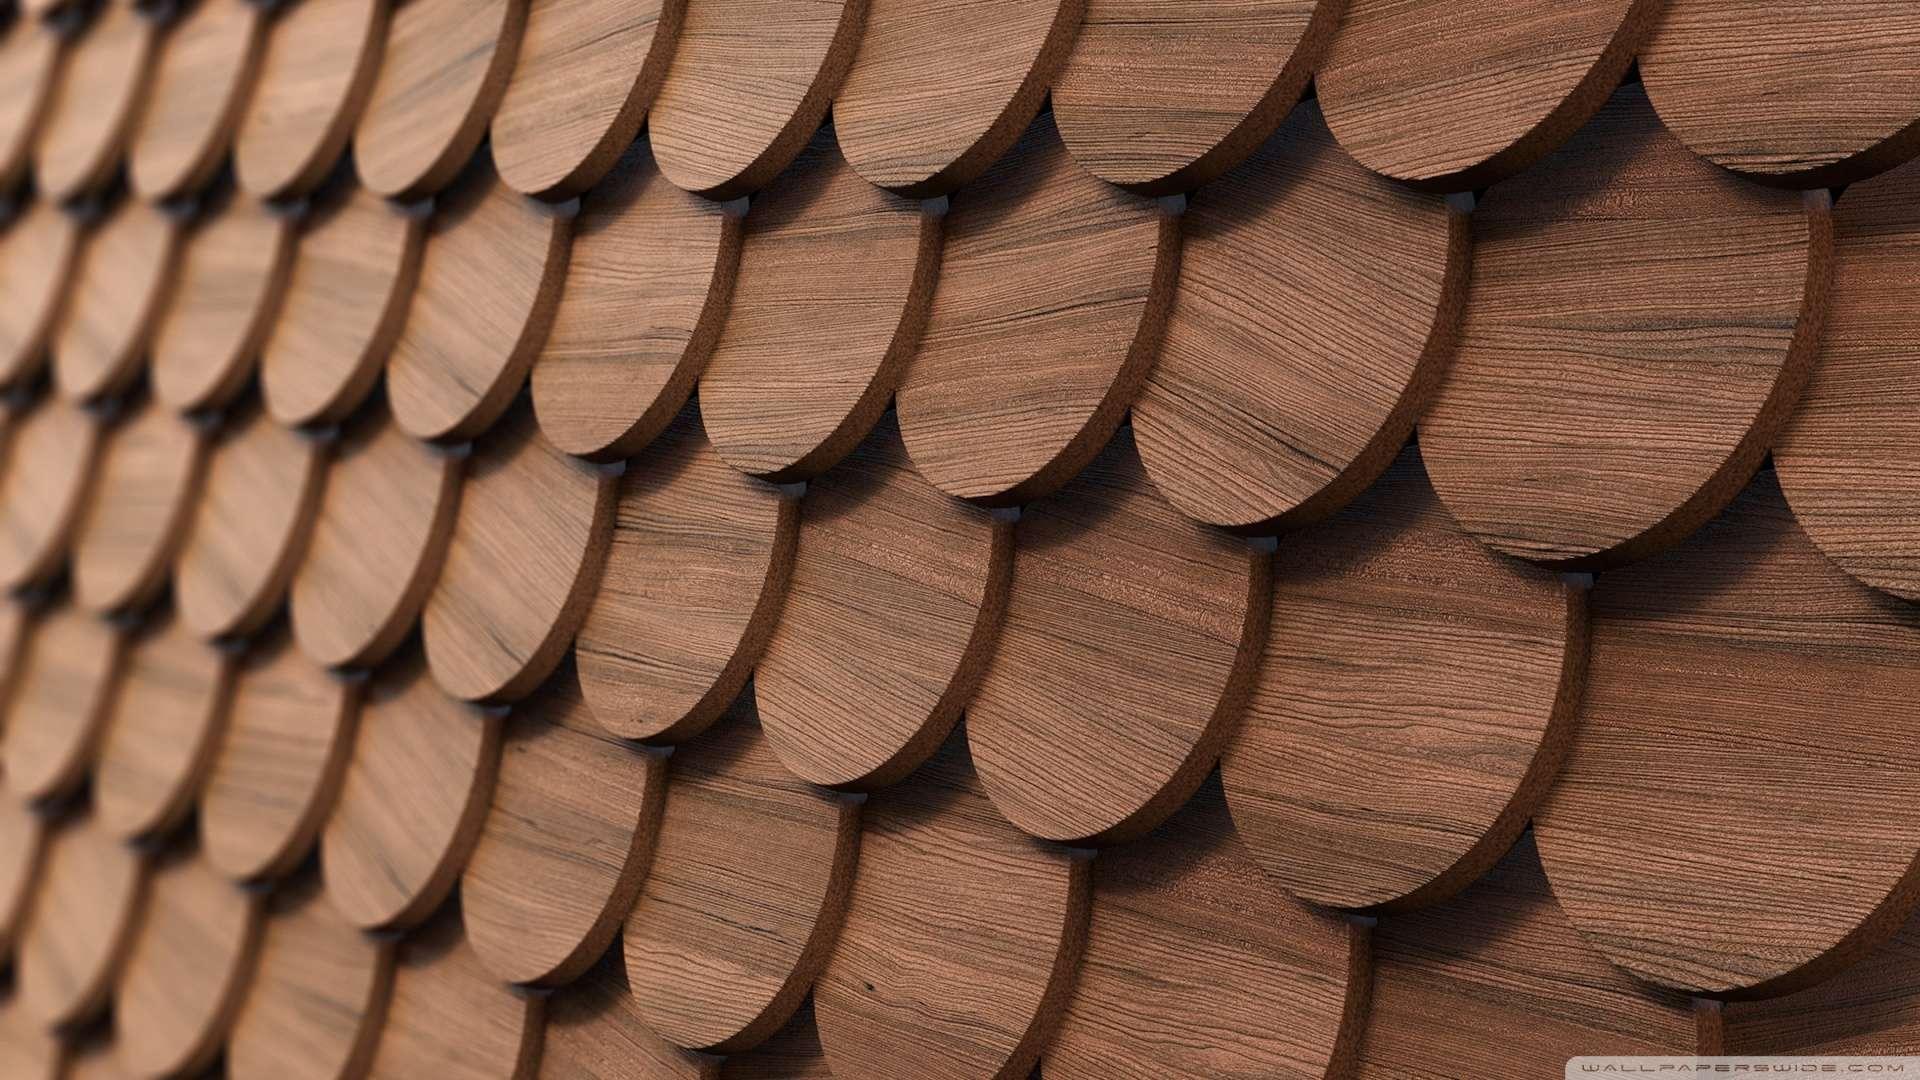 Hd wallpaper wood - Wallpaper Wooden Shingles Wallpaper 1080p Hd Upload At December 26